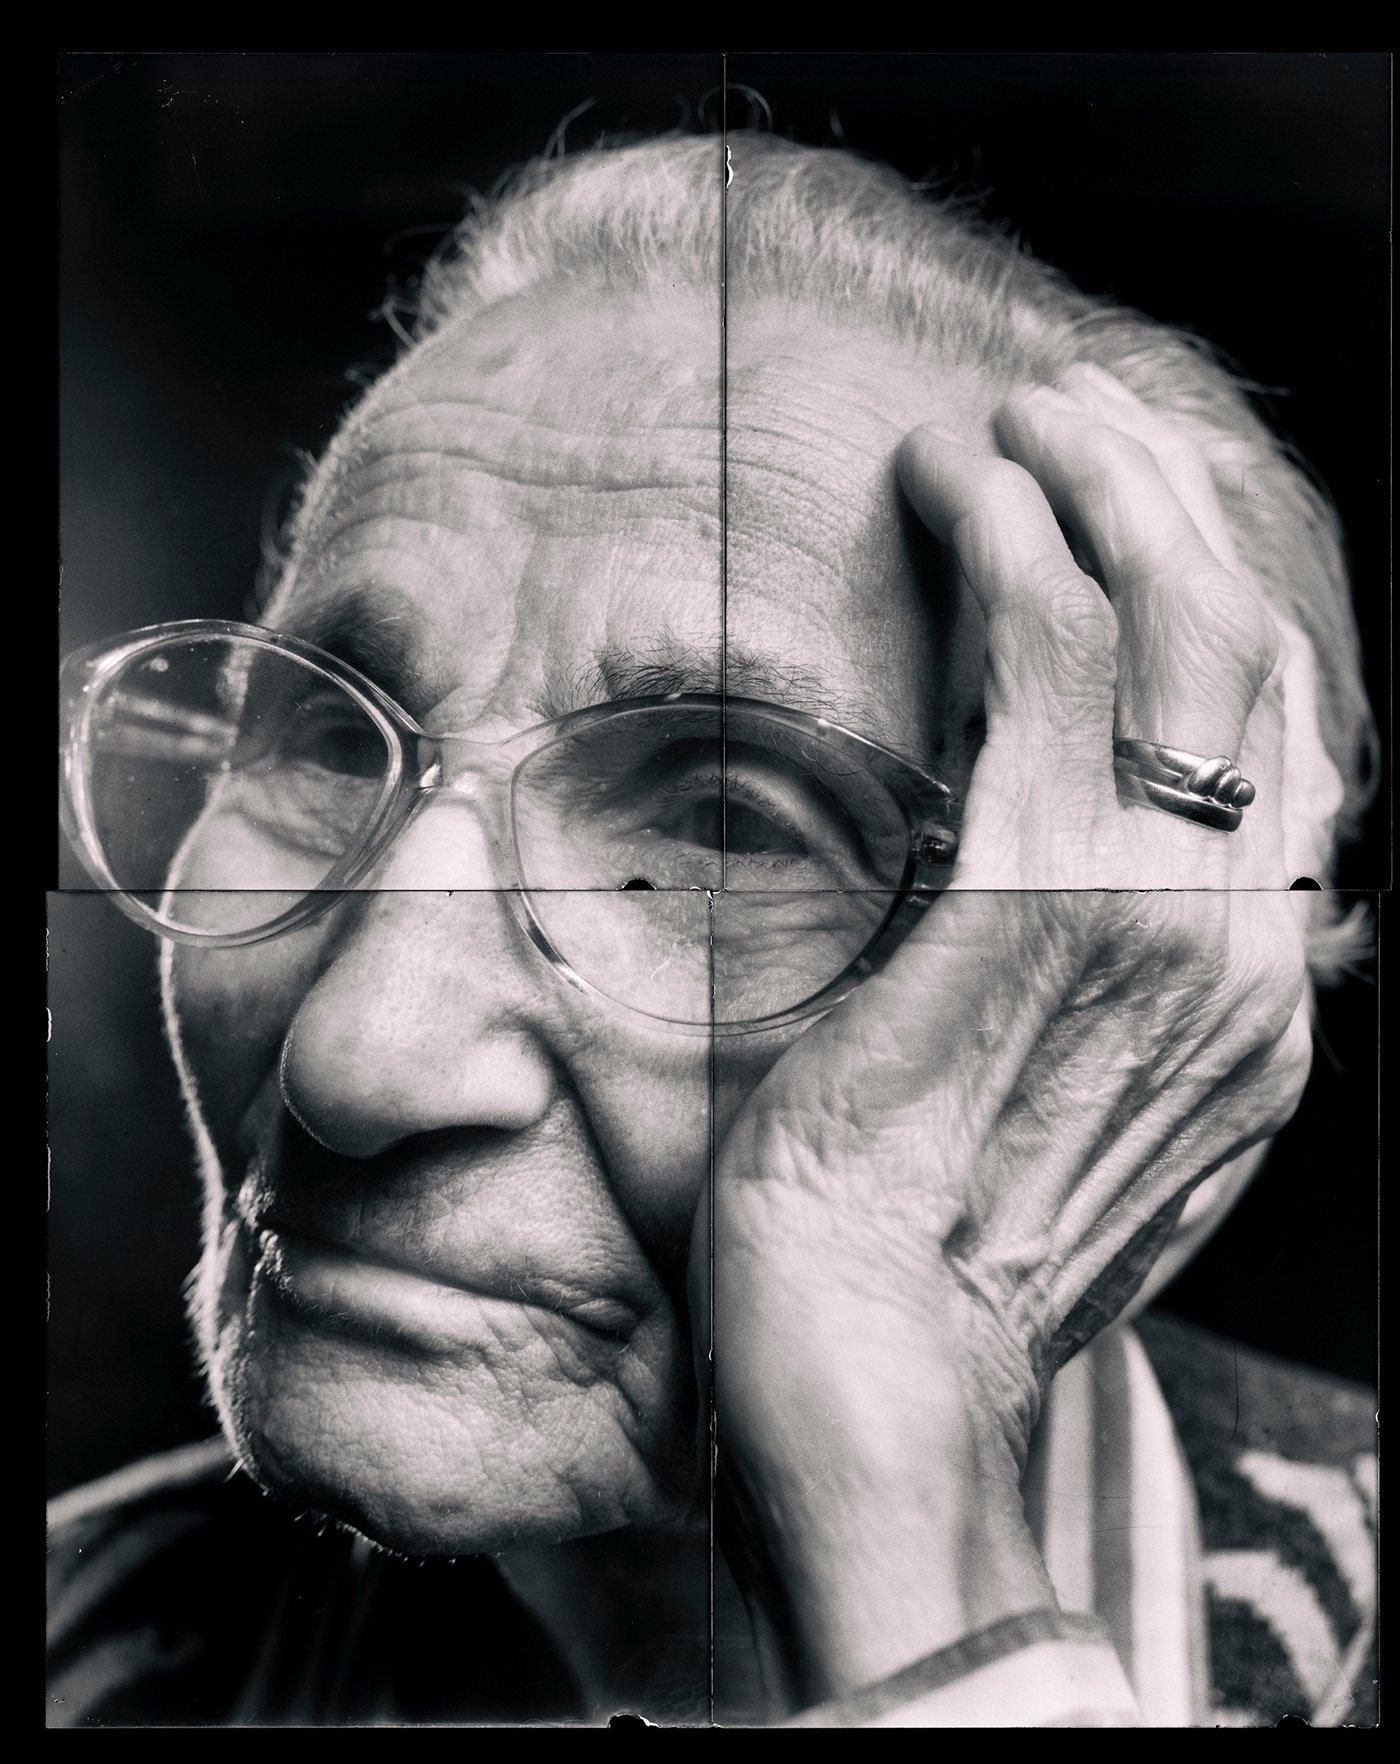 Aron Porszasz Combines 4x5 Film to Make These 8x10 Macro Portraits